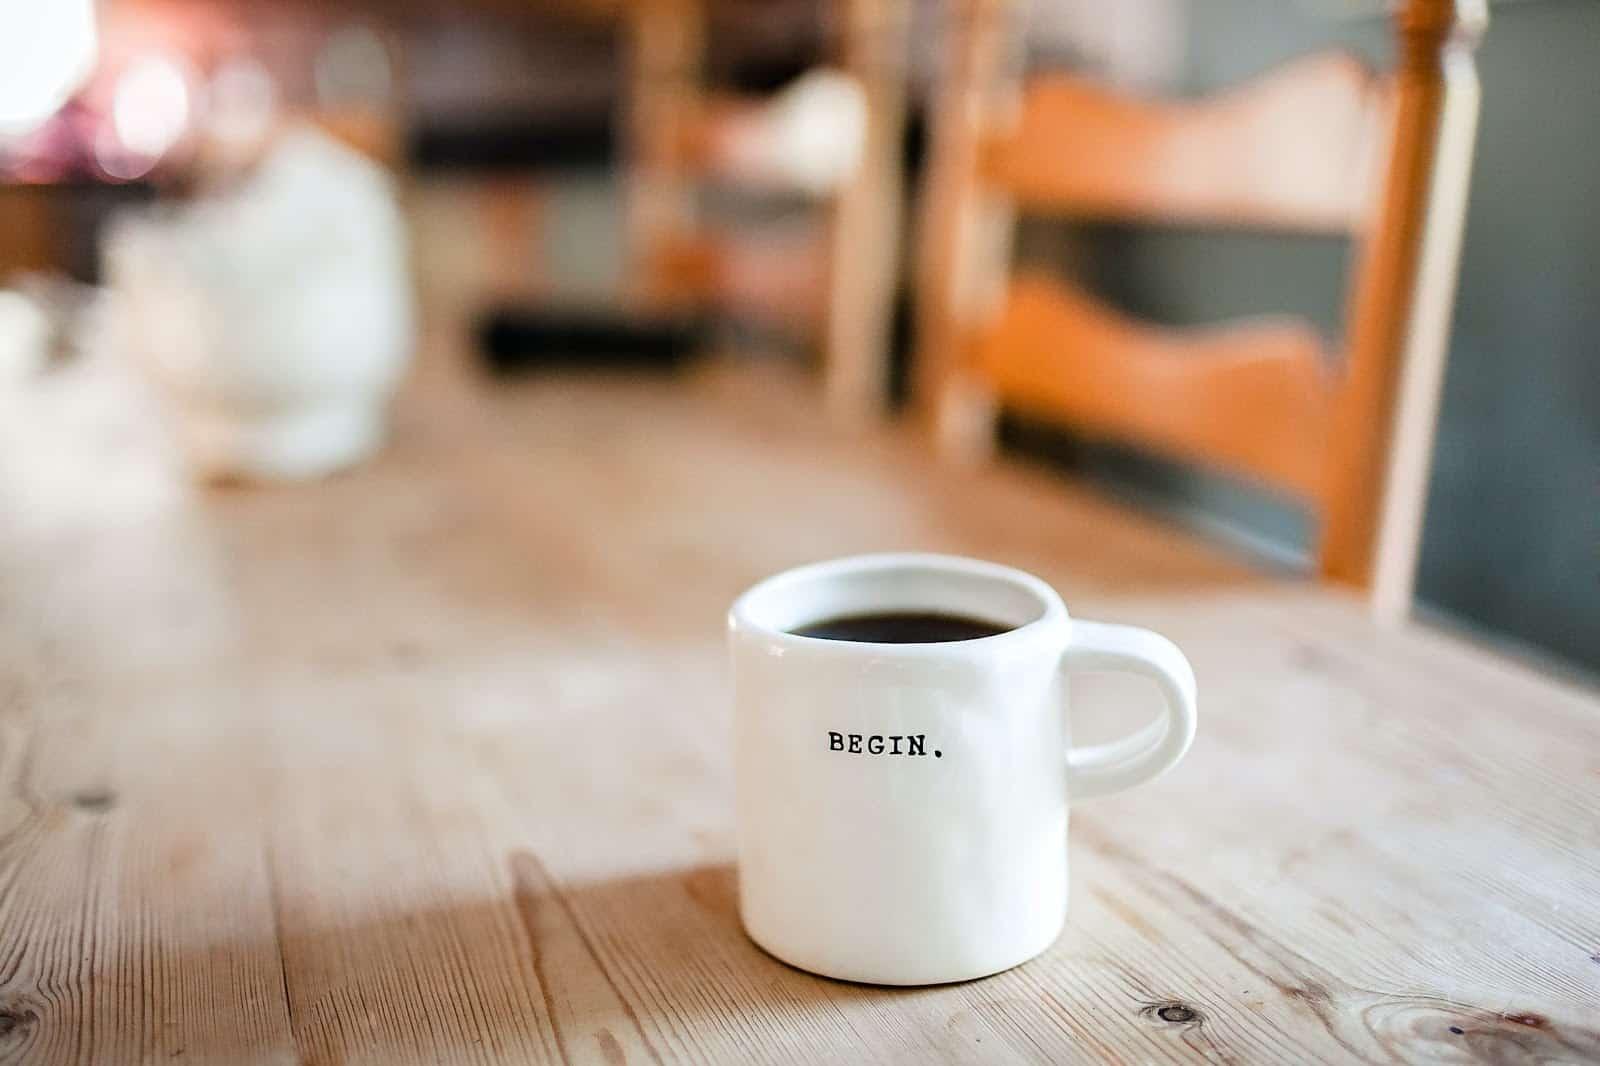 Begin cup